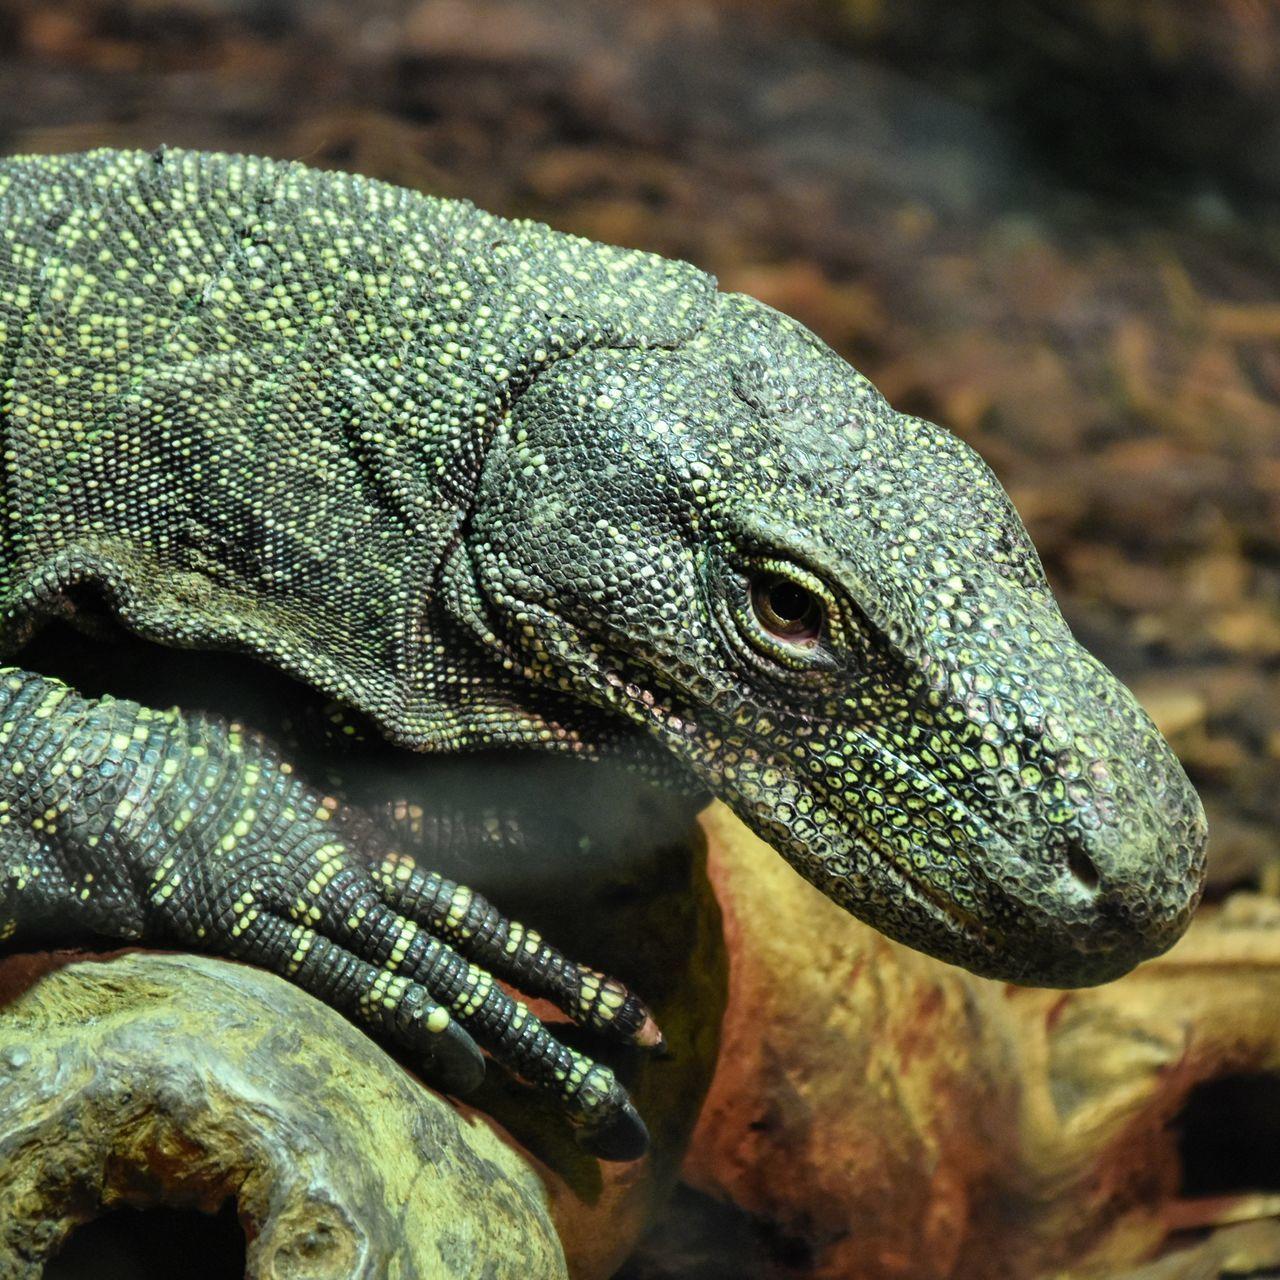 Animal Scale Animal Themes Animal Wildlife Animals In The Wild Close-up Day Komodo Dragon Nature No People One Animal Varaan